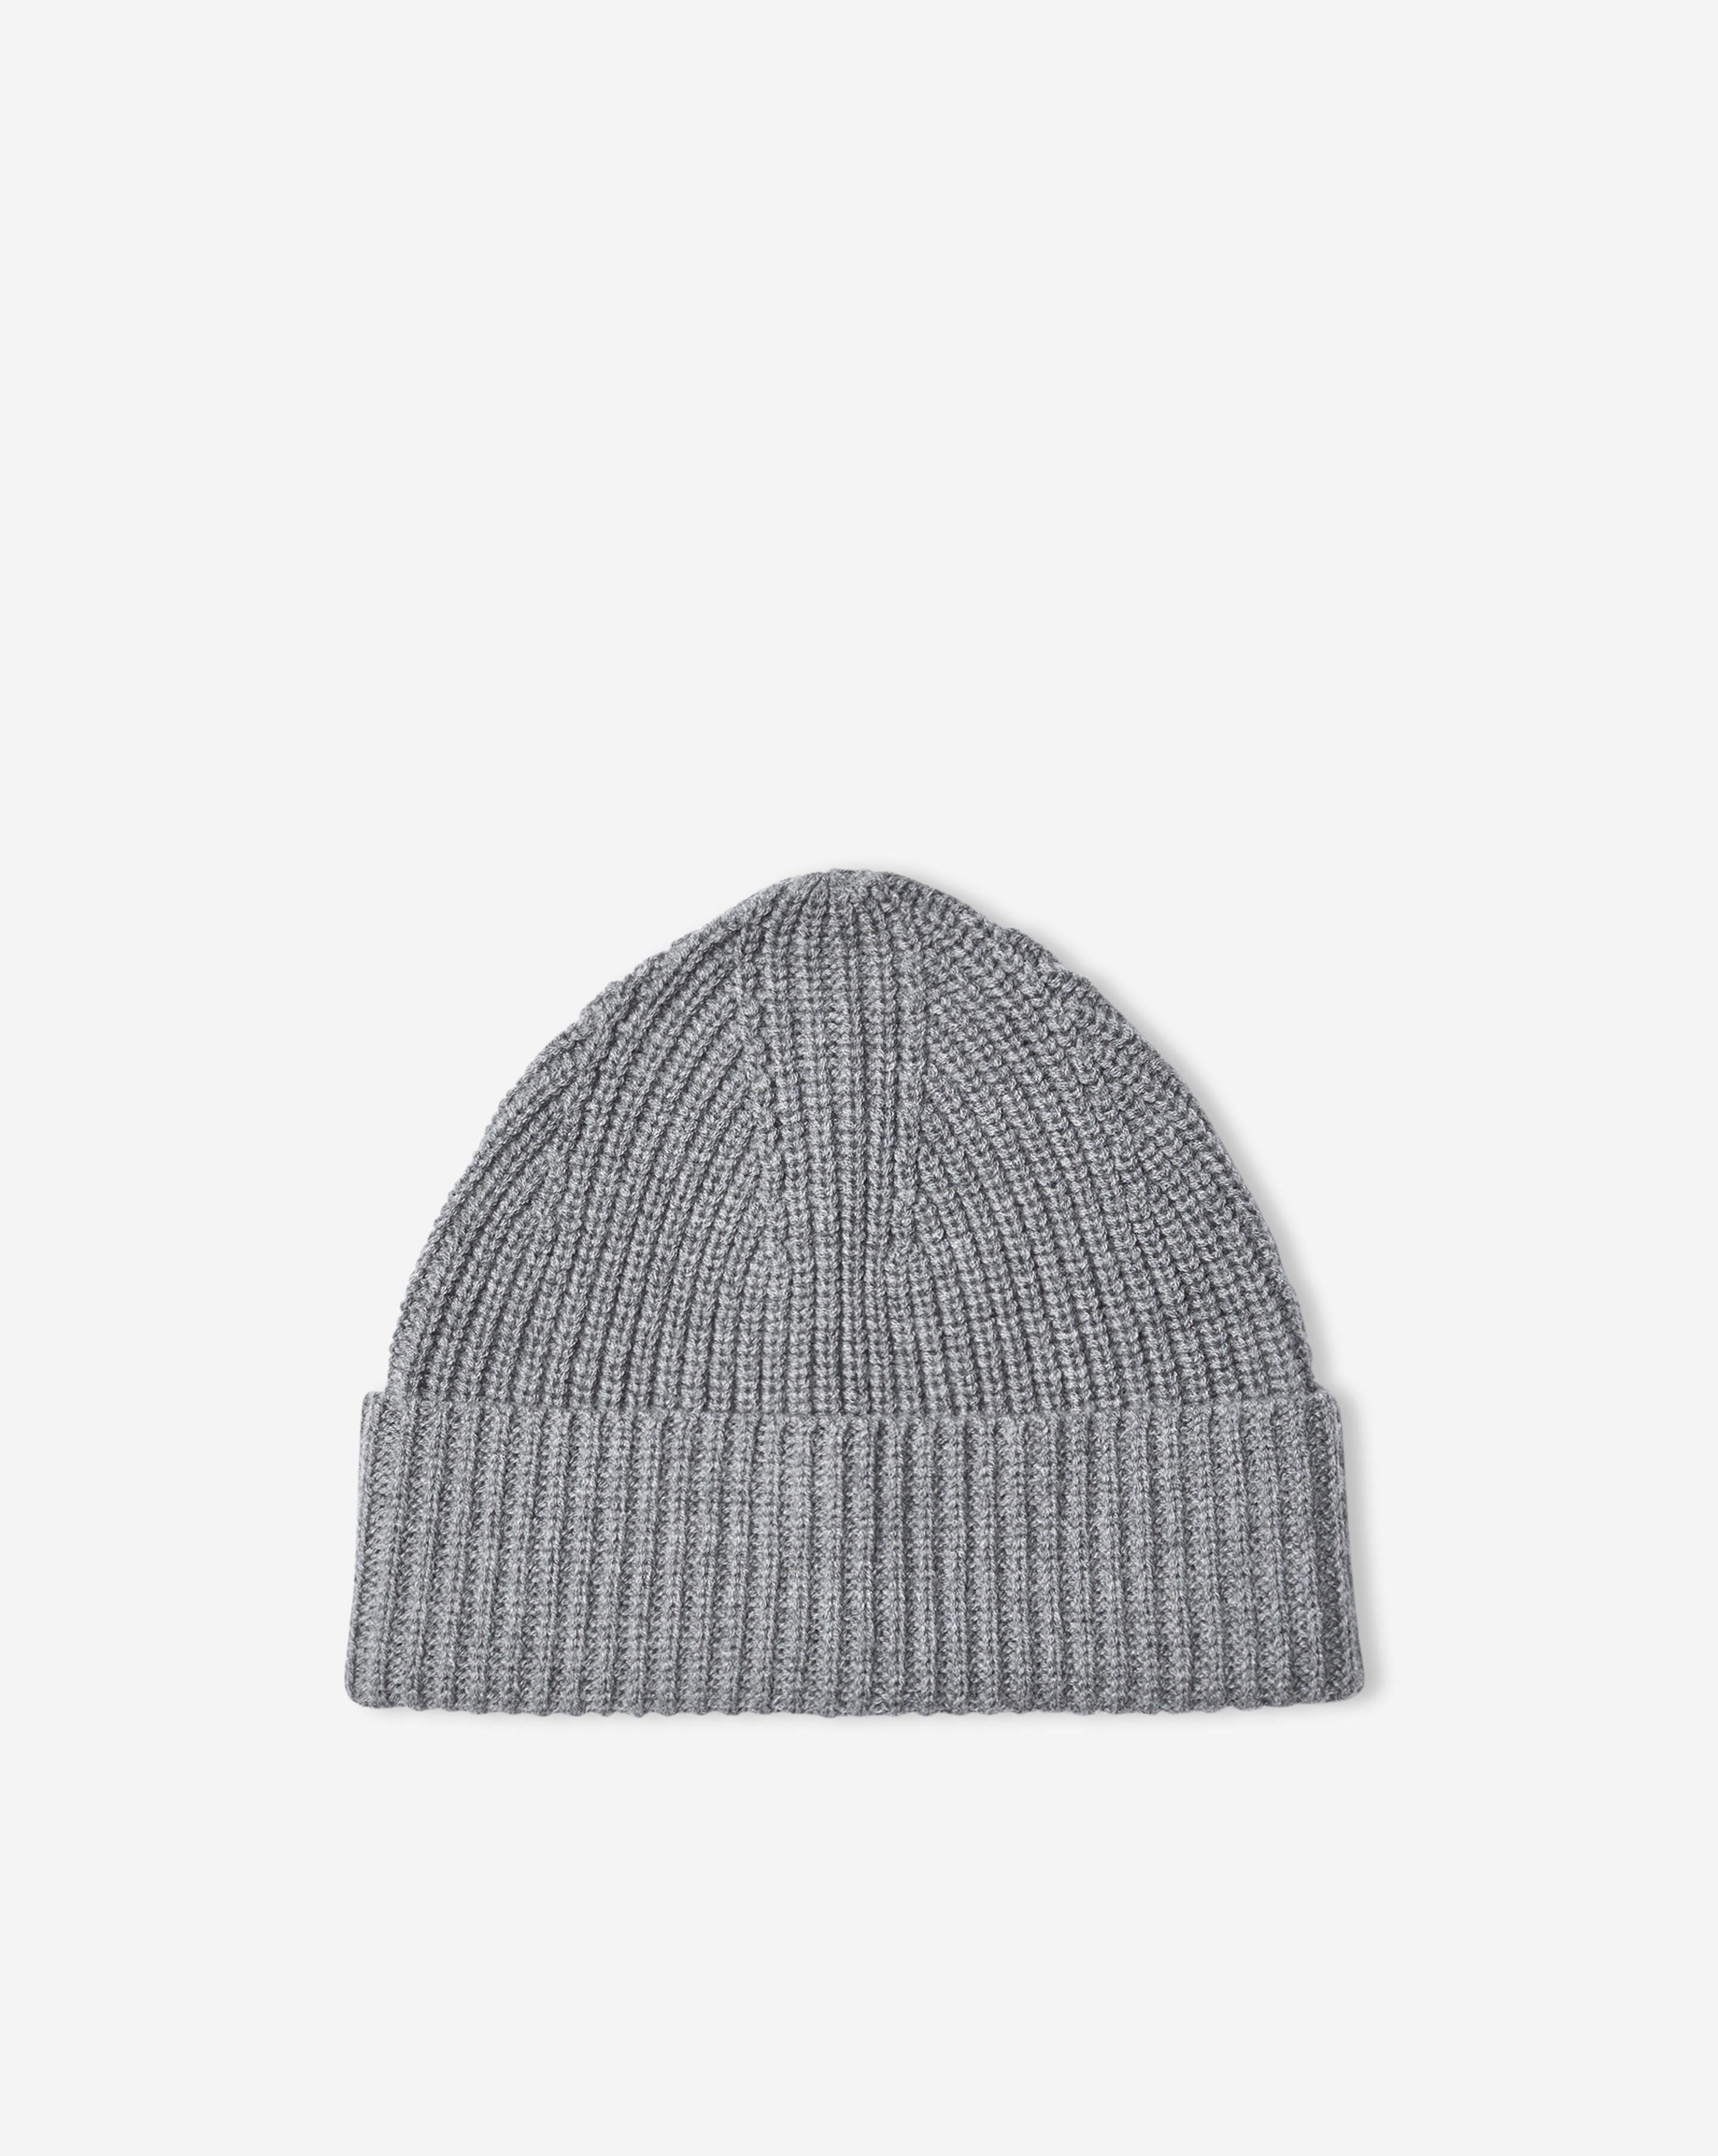 Filippa K Soft Wool Beanie Grey Melange in Gray for Men - Lyst db474f4d5907